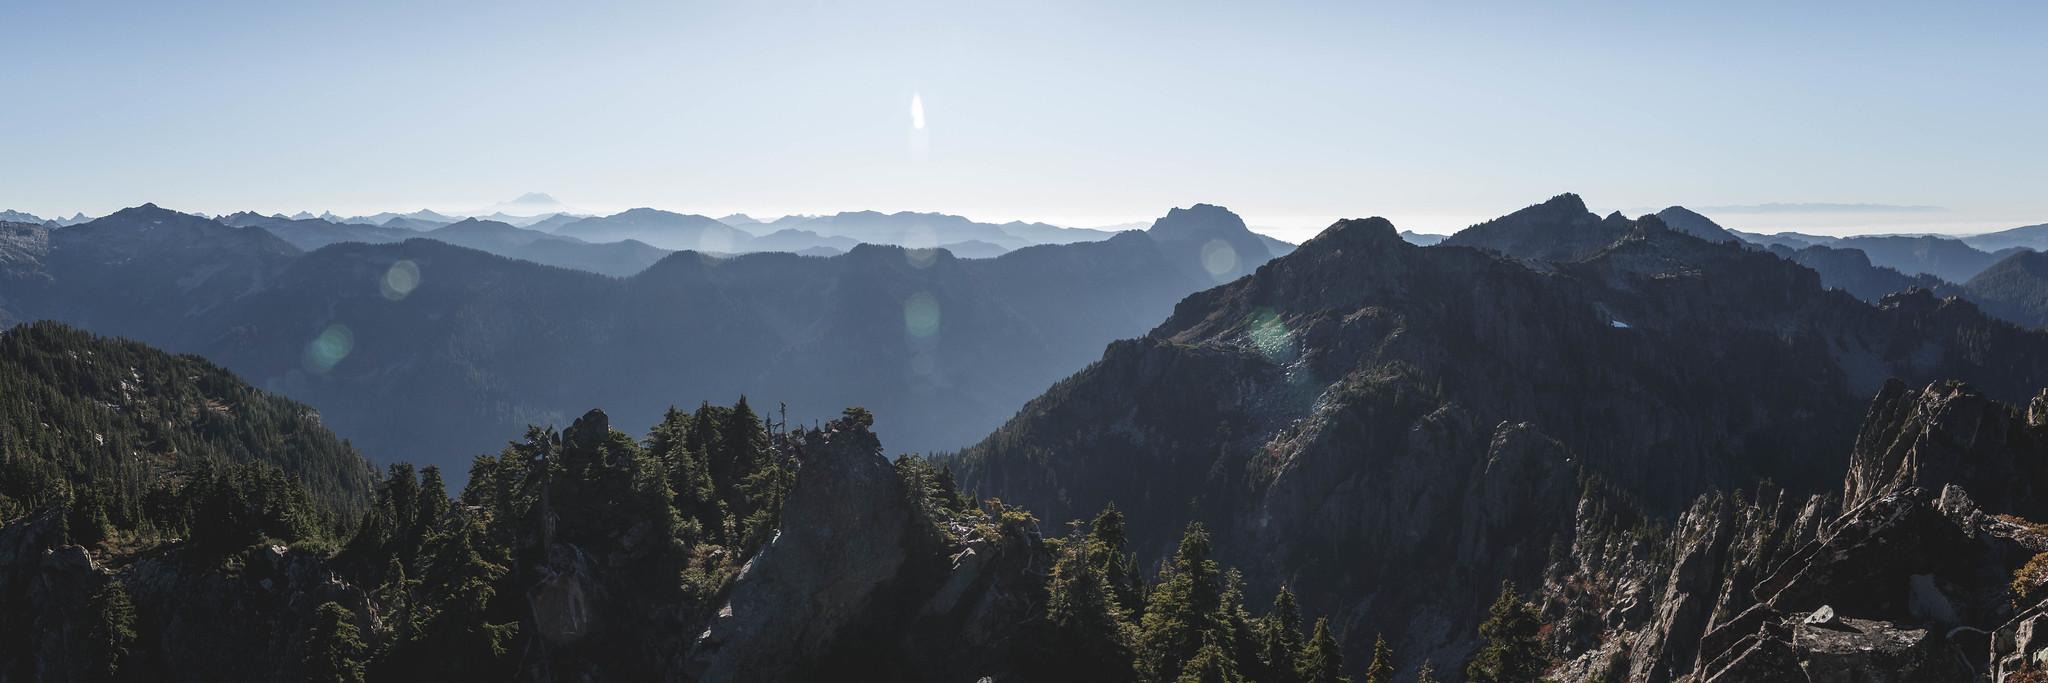 South panoramic view